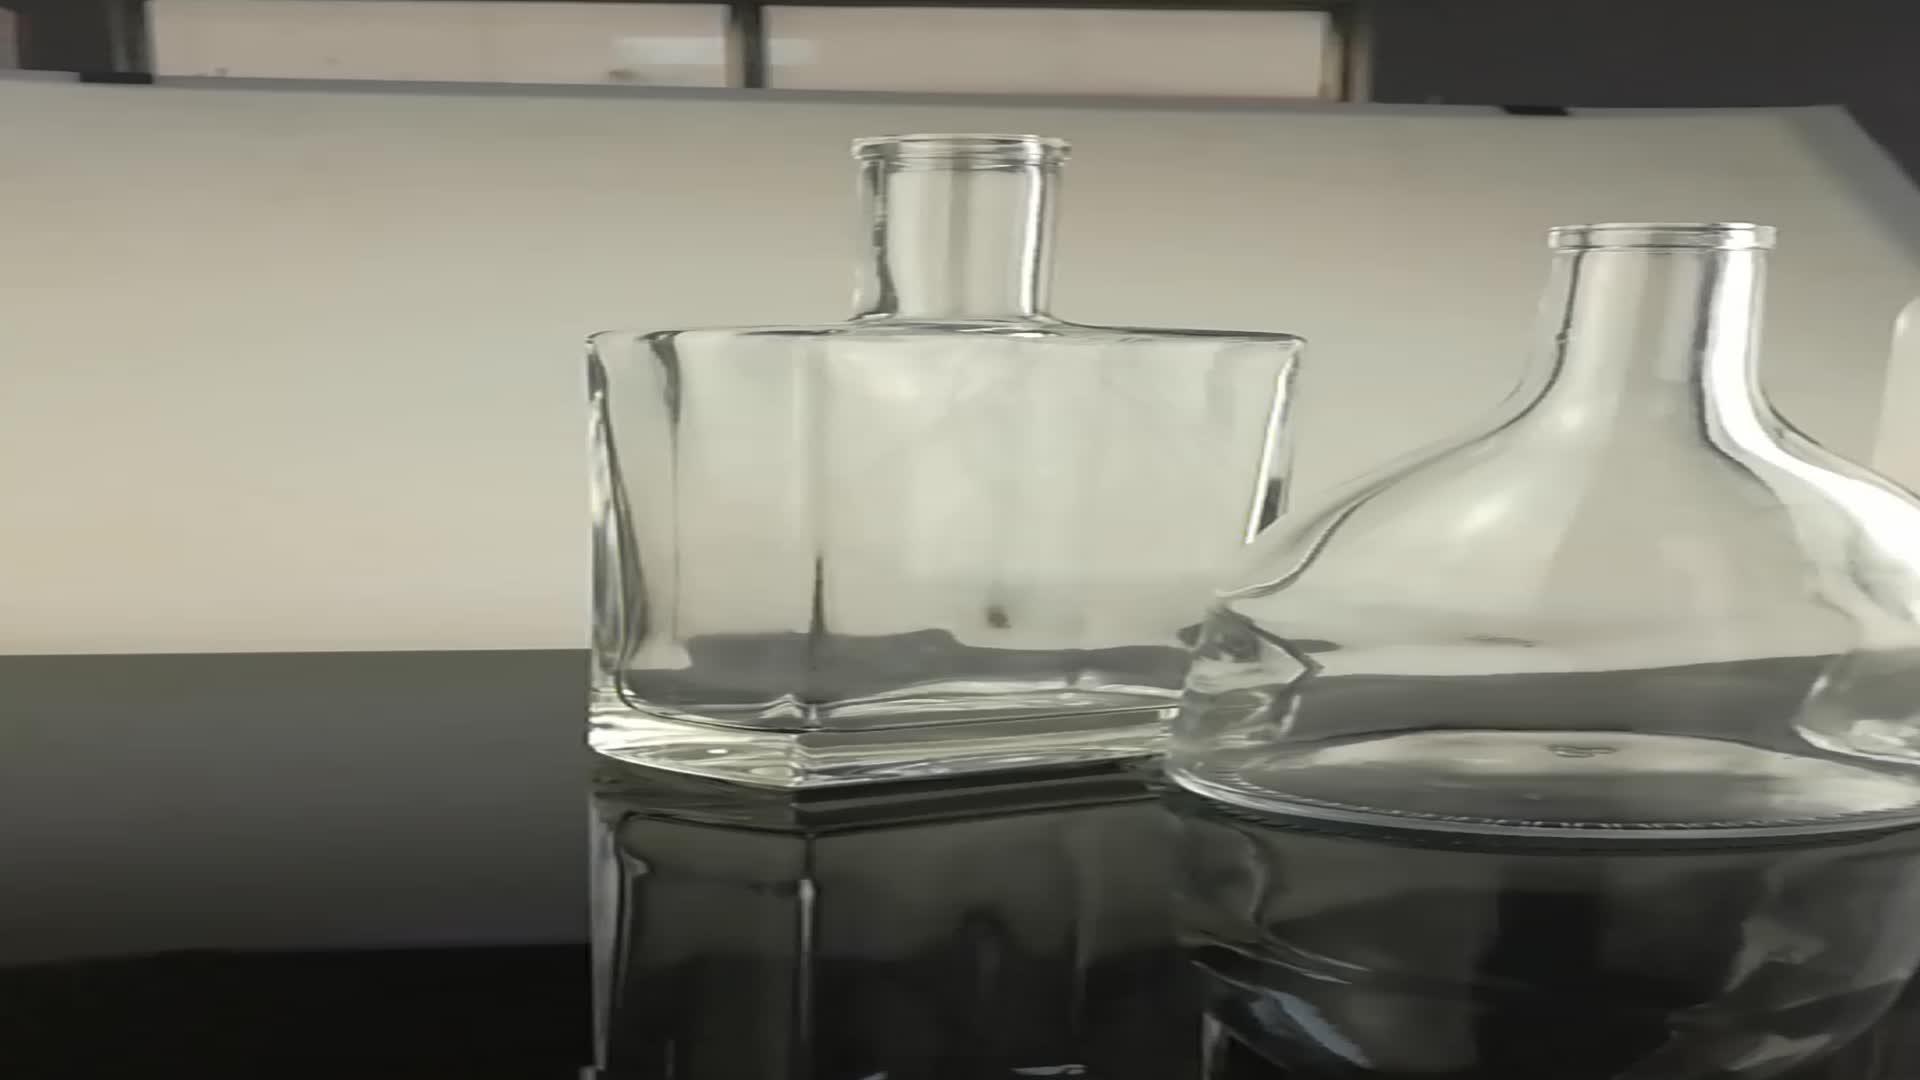 O alimento contatou a garrafa de vidro da garrafa 700ml do vodka da garrafa do licor 750ml